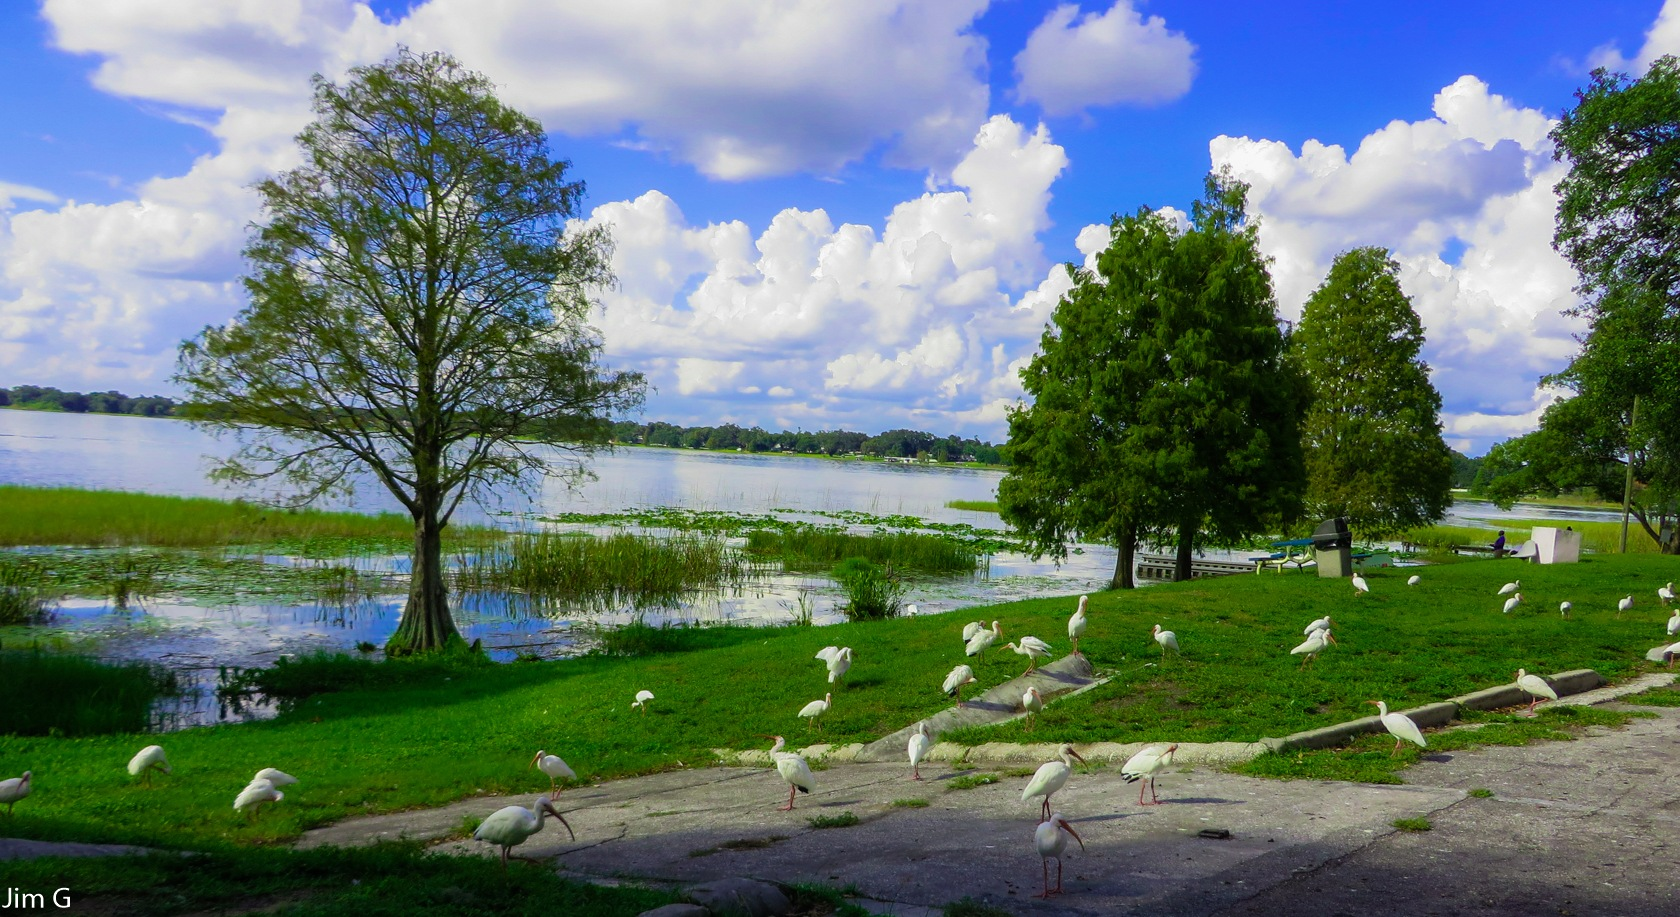 Lakeside with Ibis Feeding by Jim Graham